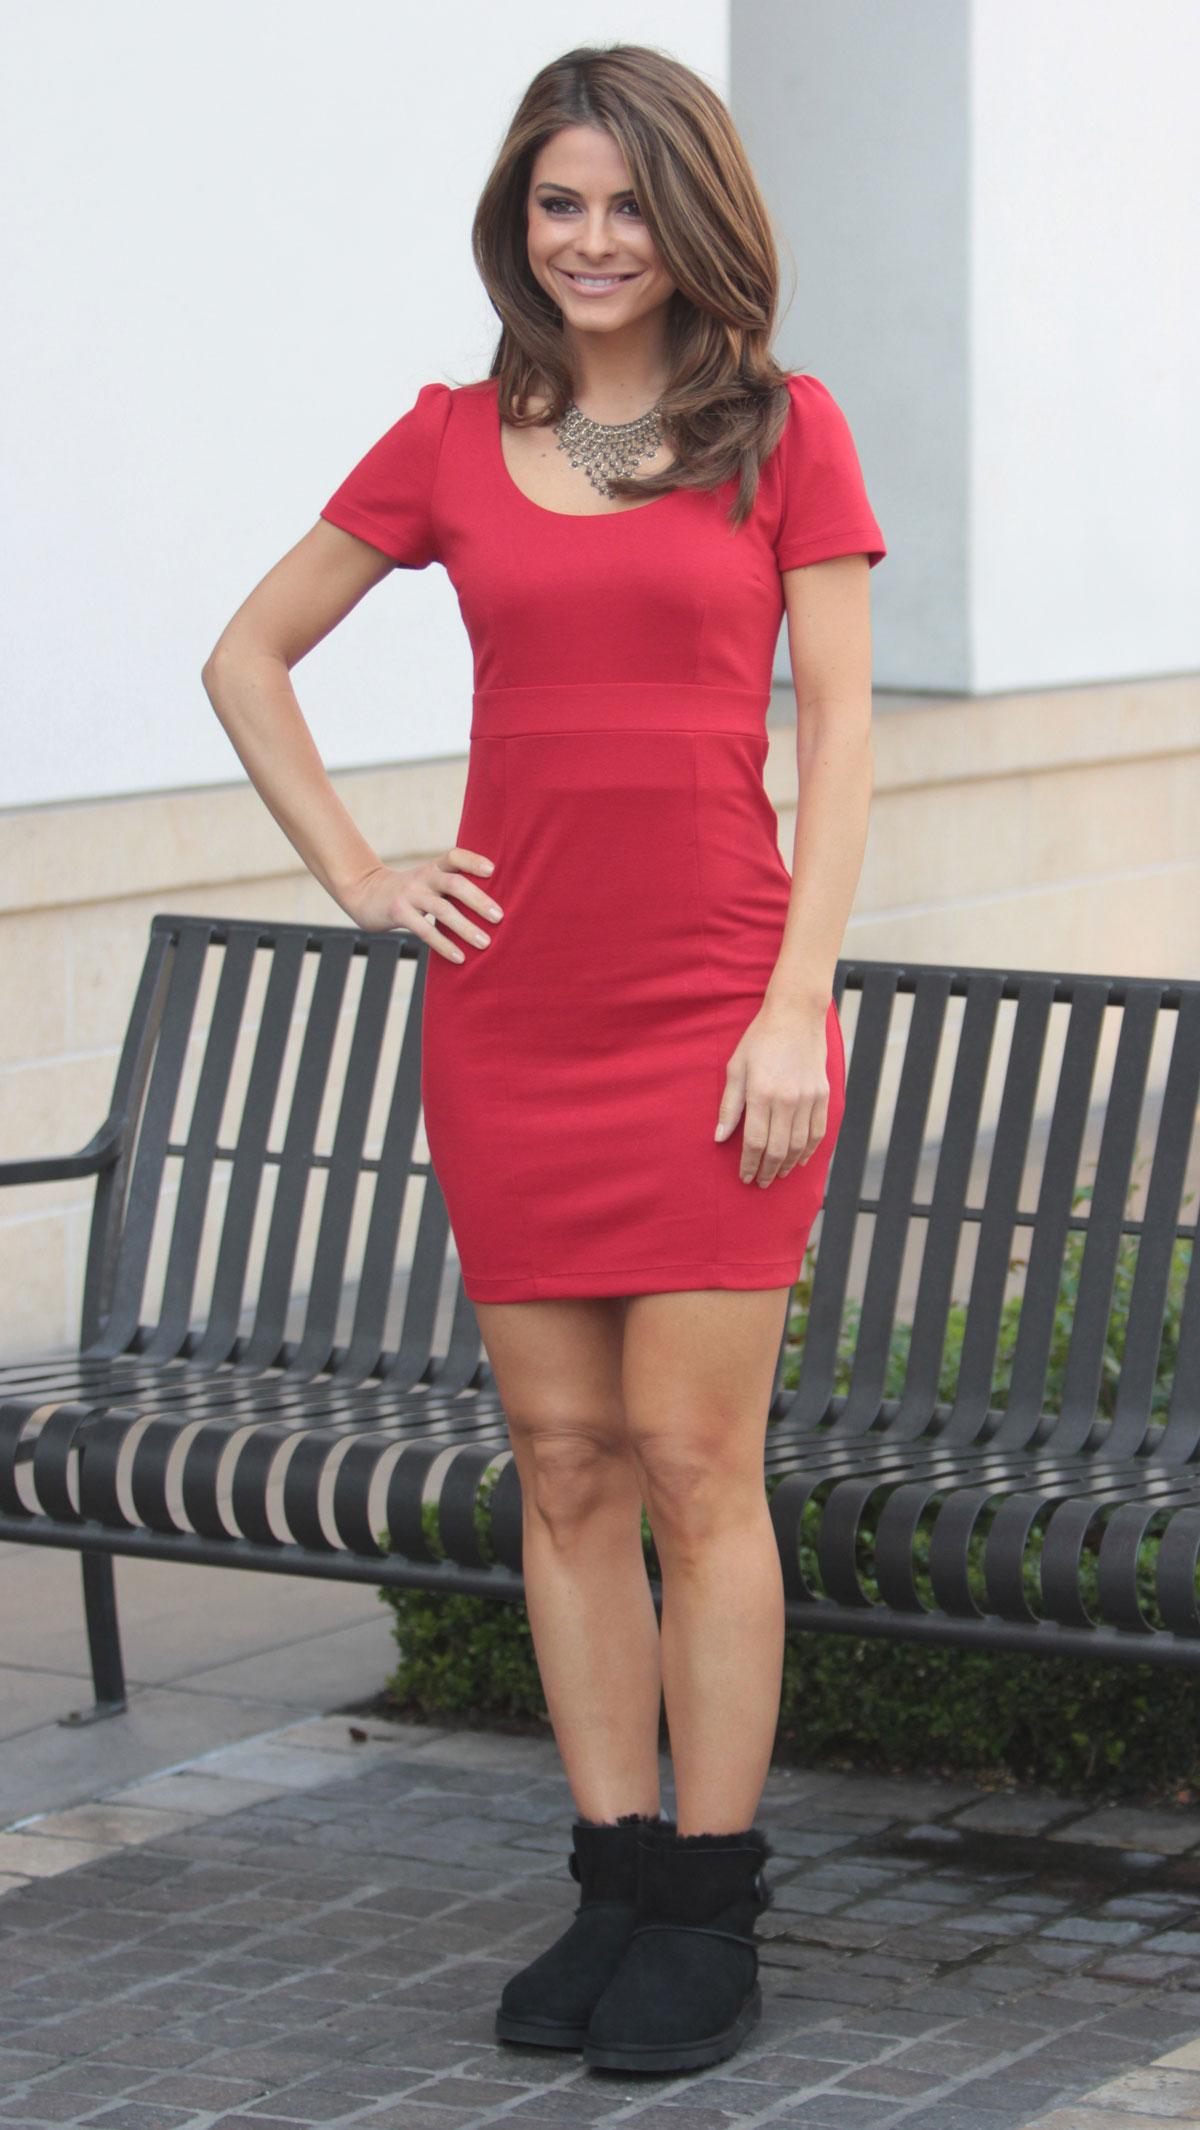 Haruno Sexy Model Maria Menounos Photo Shoot In Red Dress